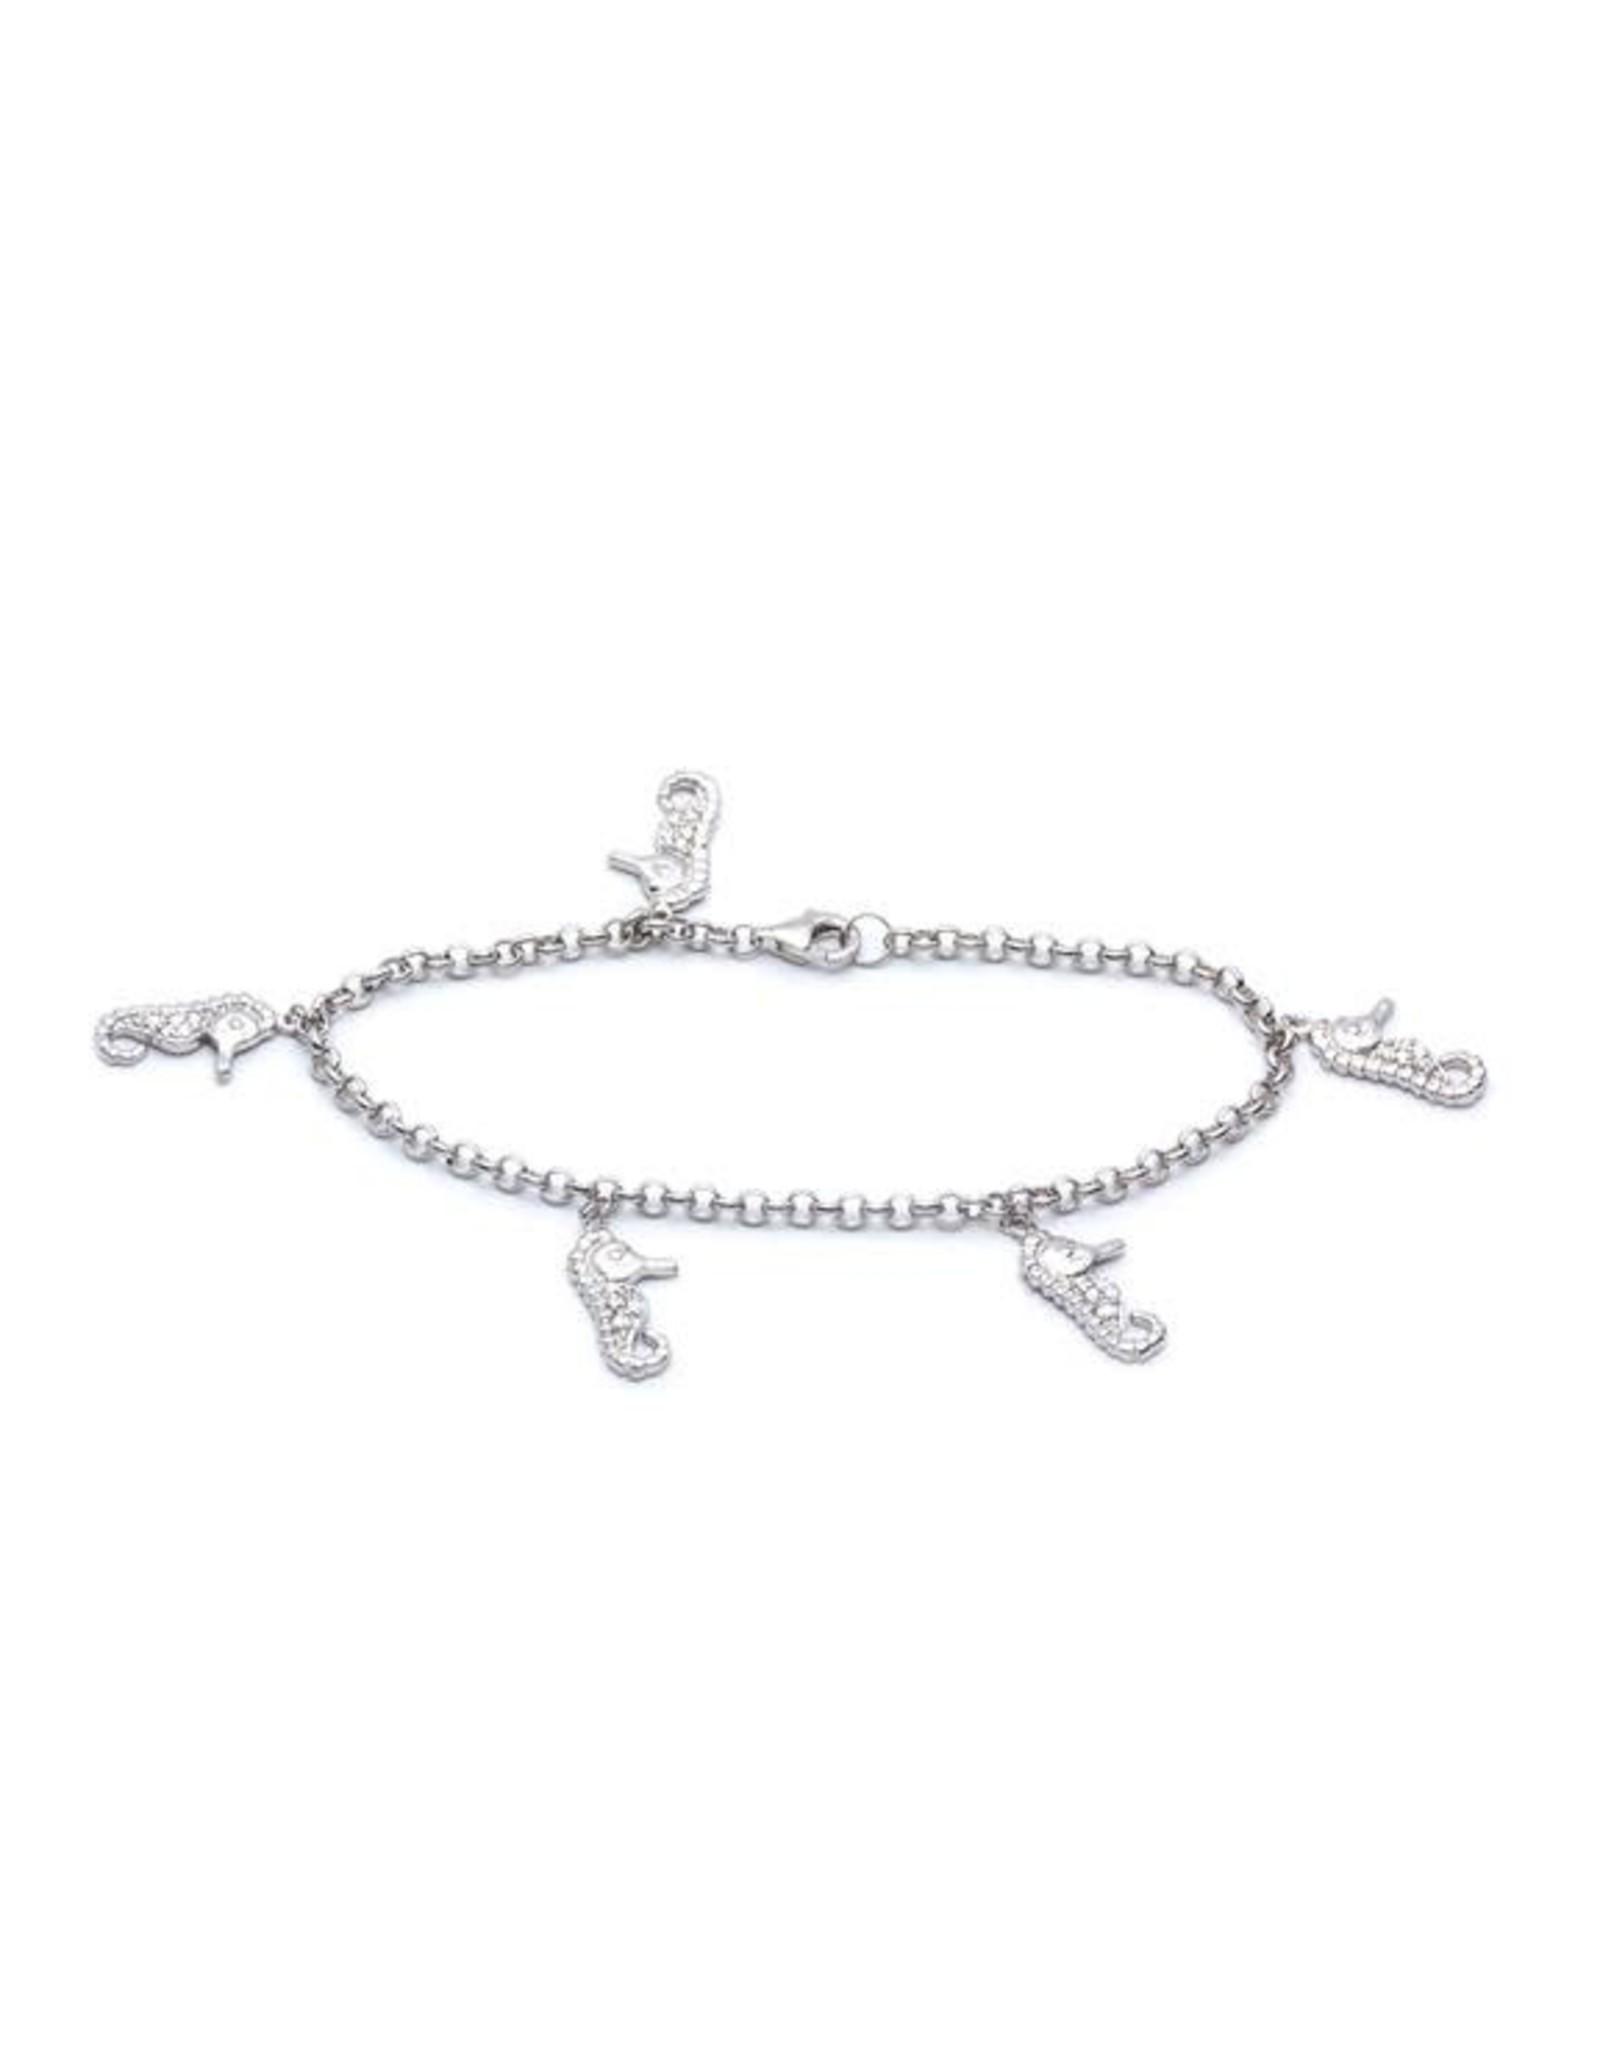 CZ Seahorse Charm Bracelet